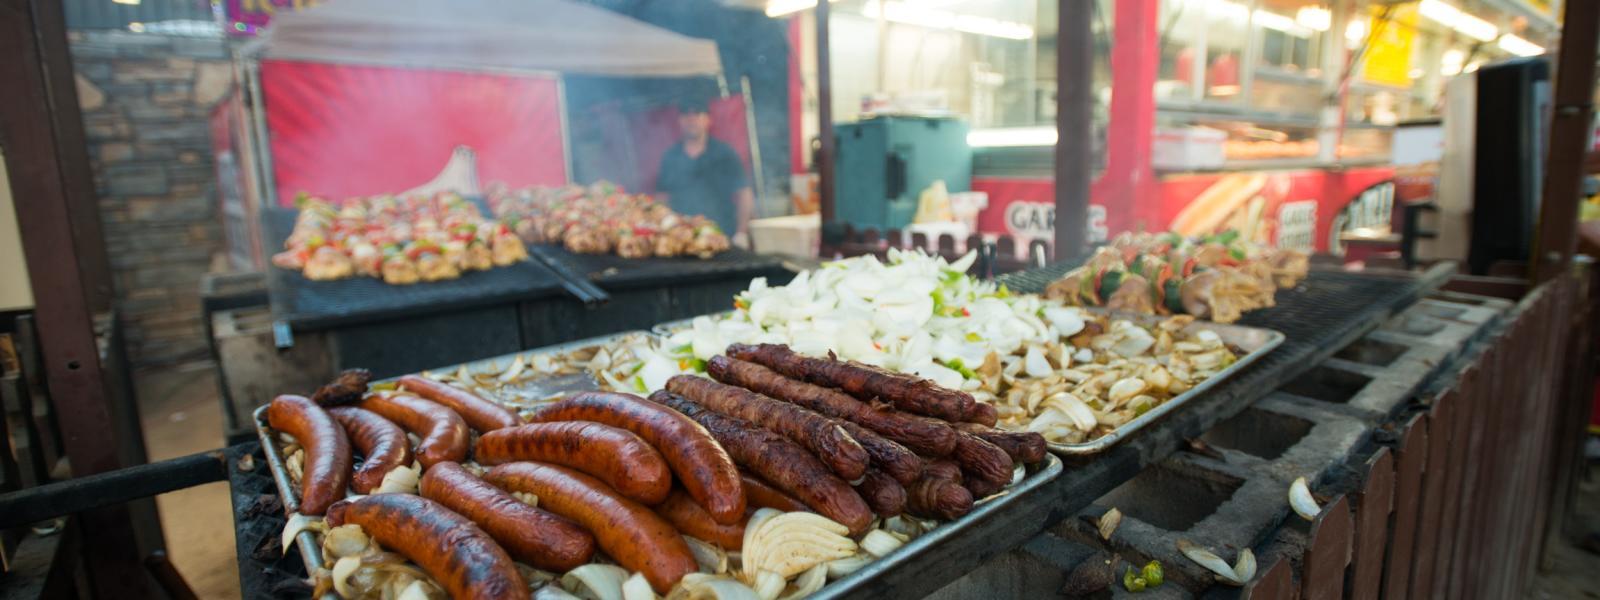 Mid-State Fair Eats